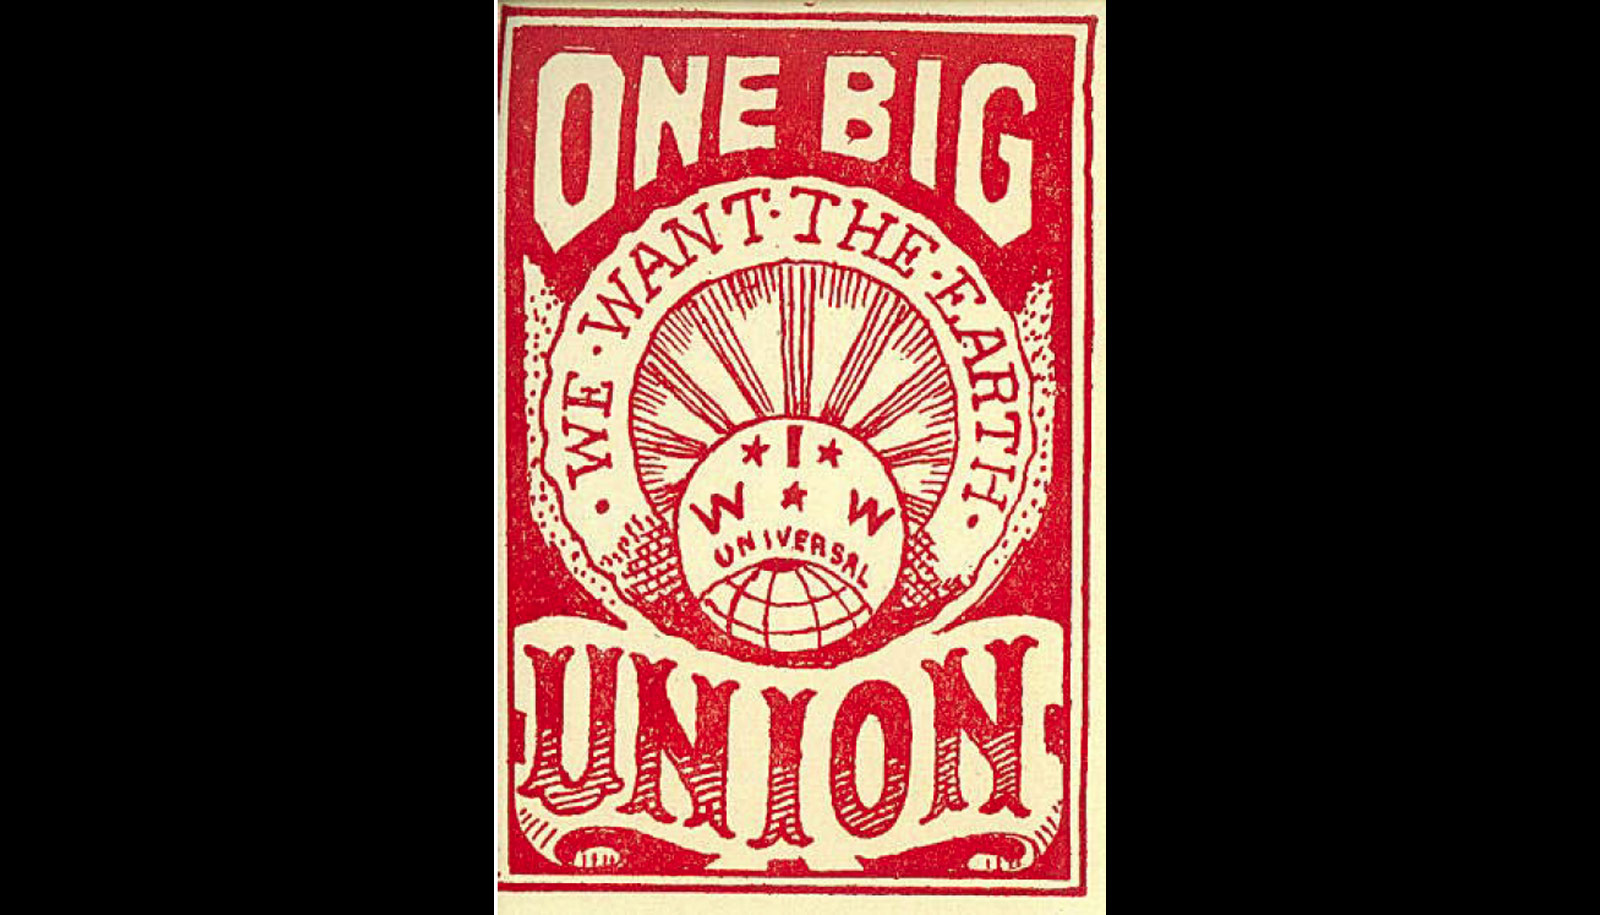 one big union sticker